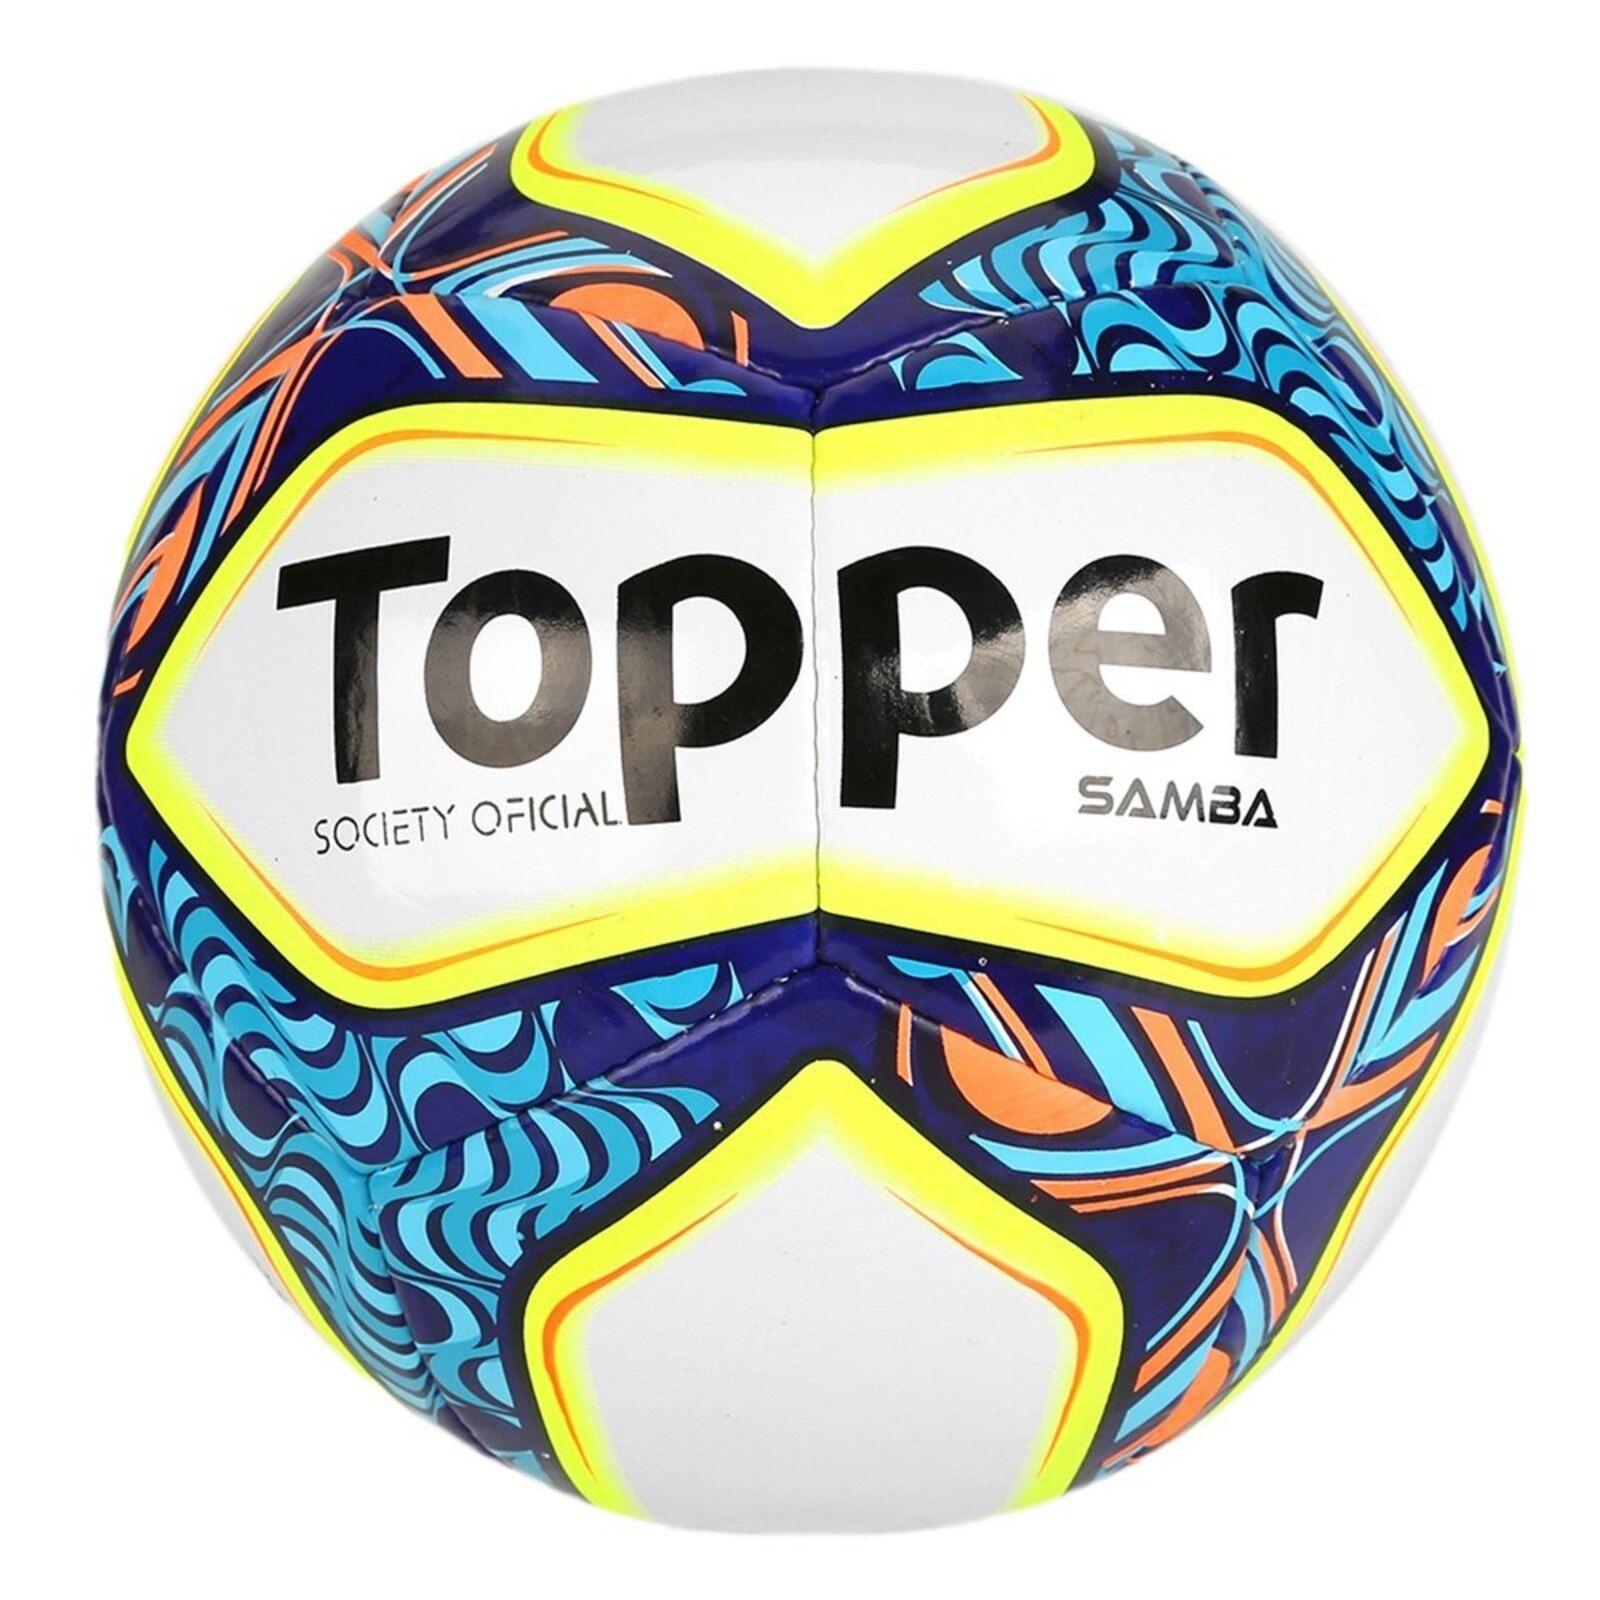 Bola De Futebol Society Topper Samba Futebol Society Samba E Topper